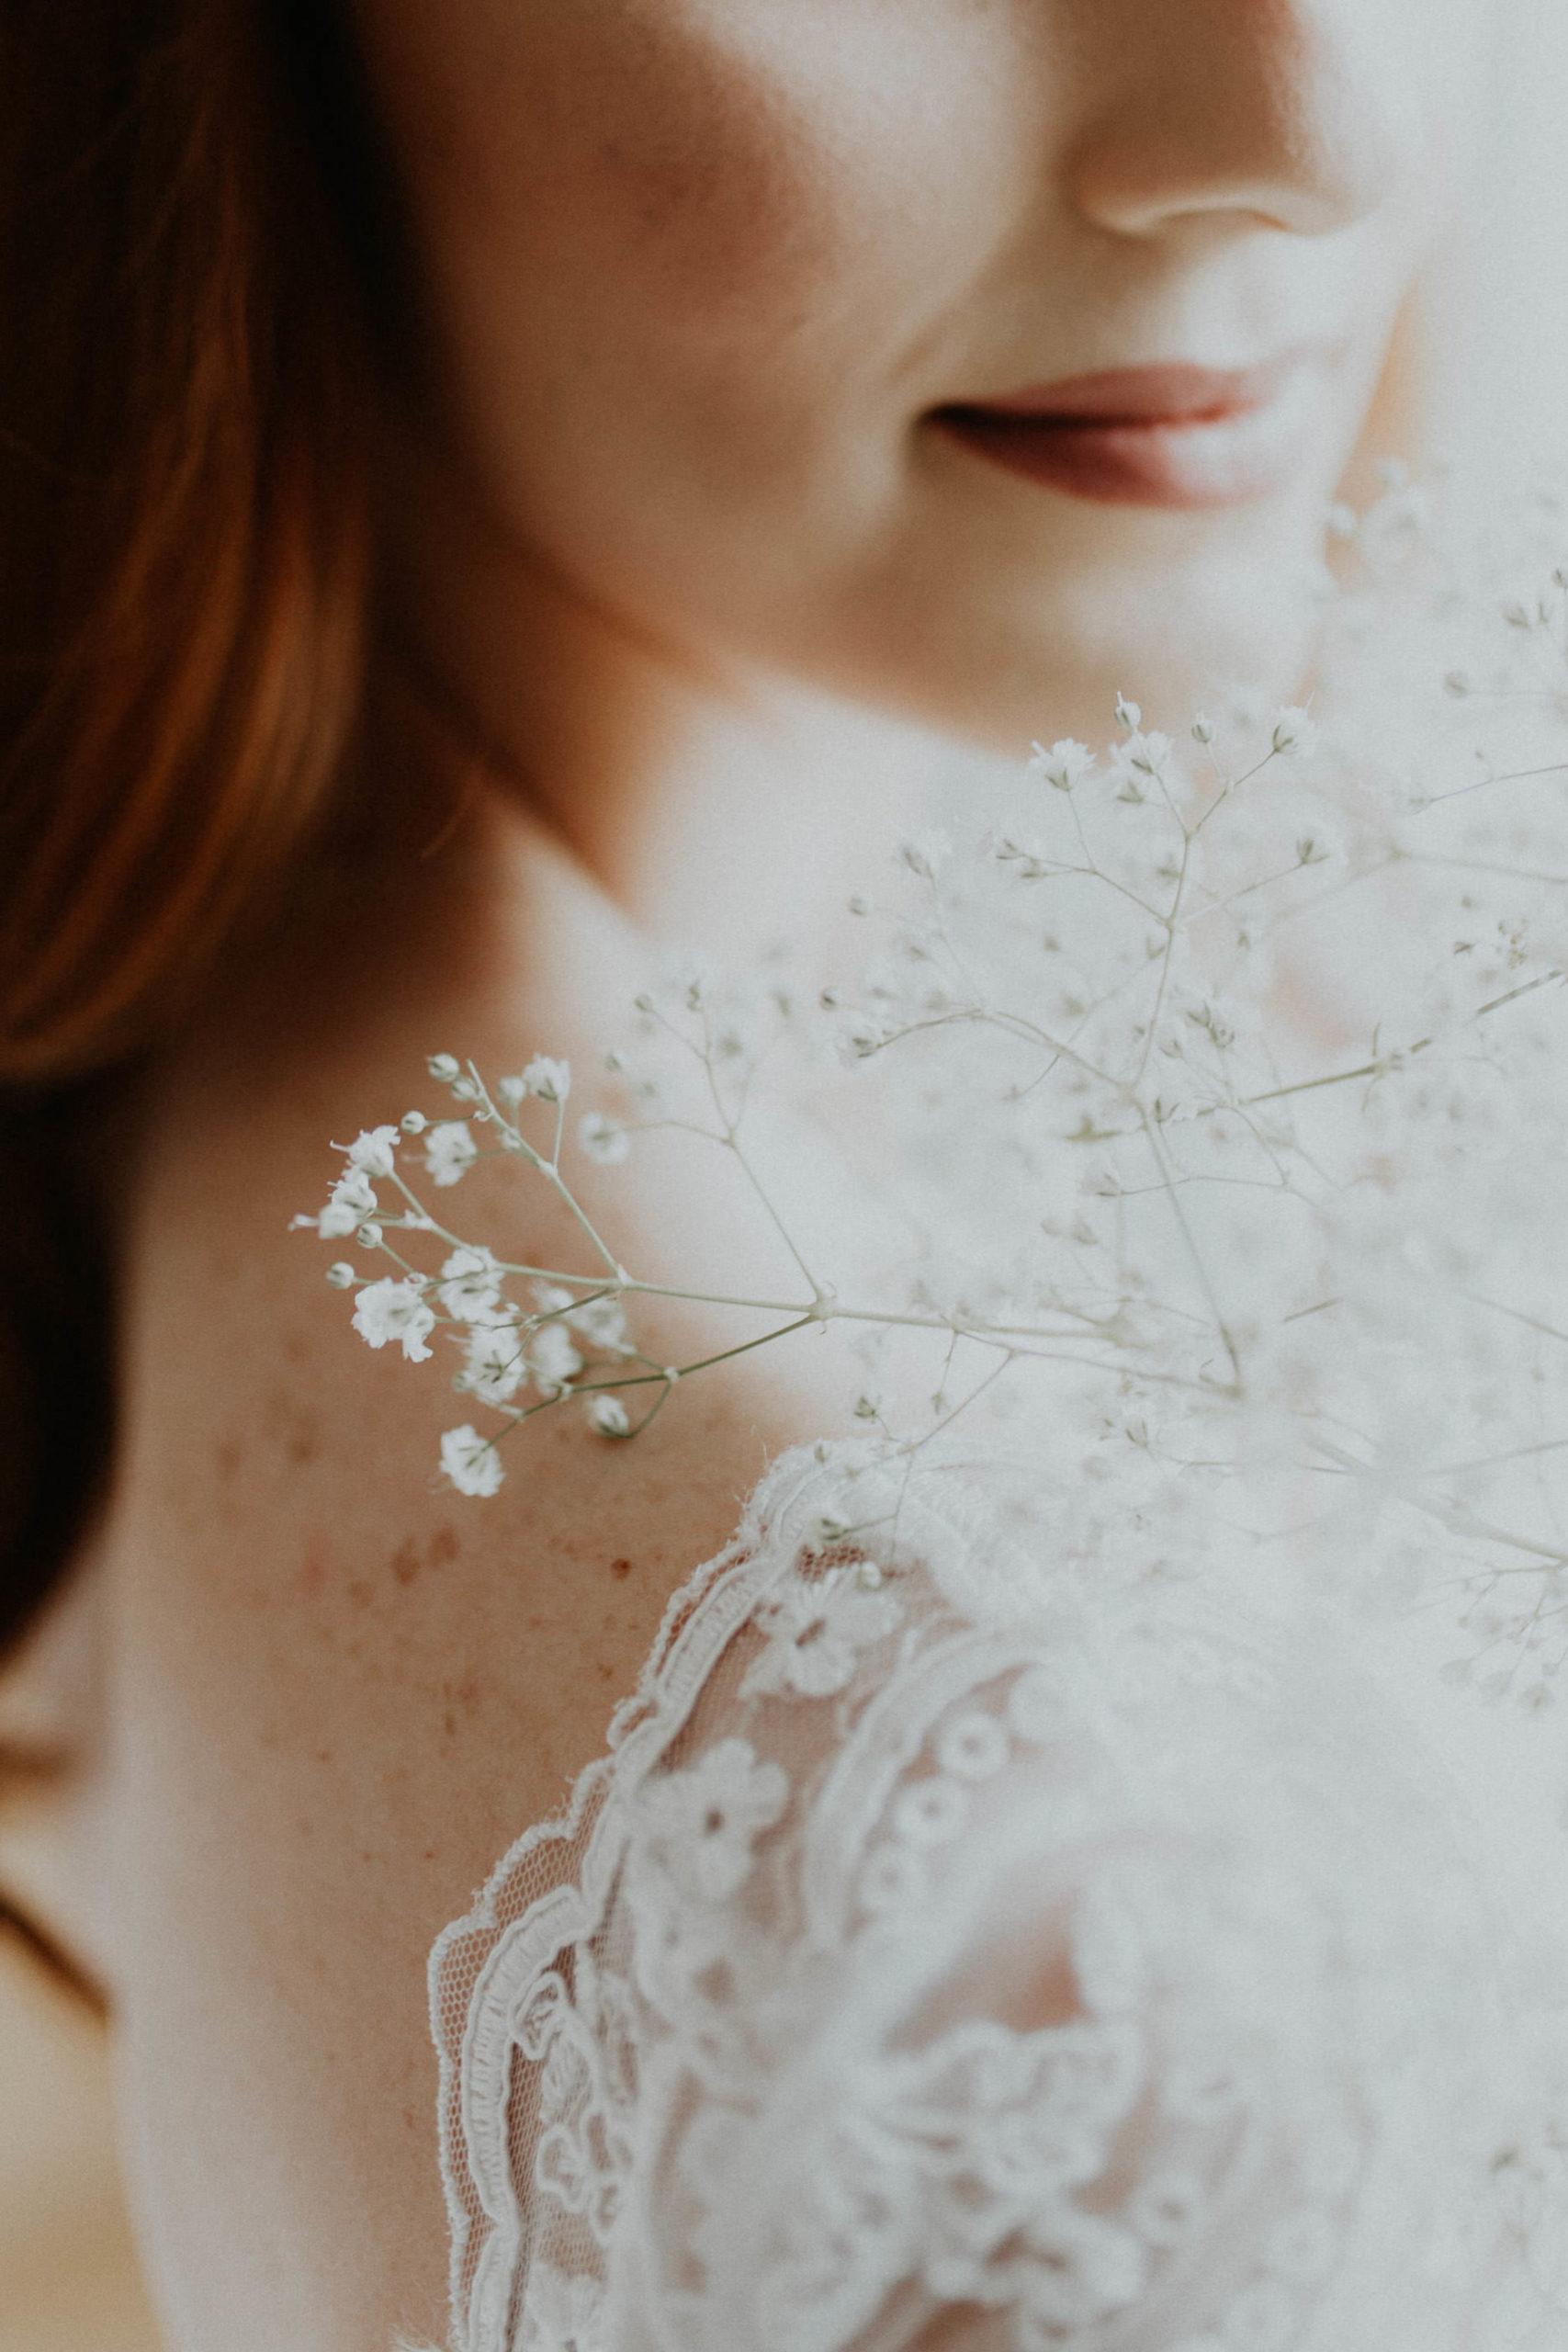 Karine Britto | Fotografia Minimalista | Casamentos Diurnos & Mini Weddings